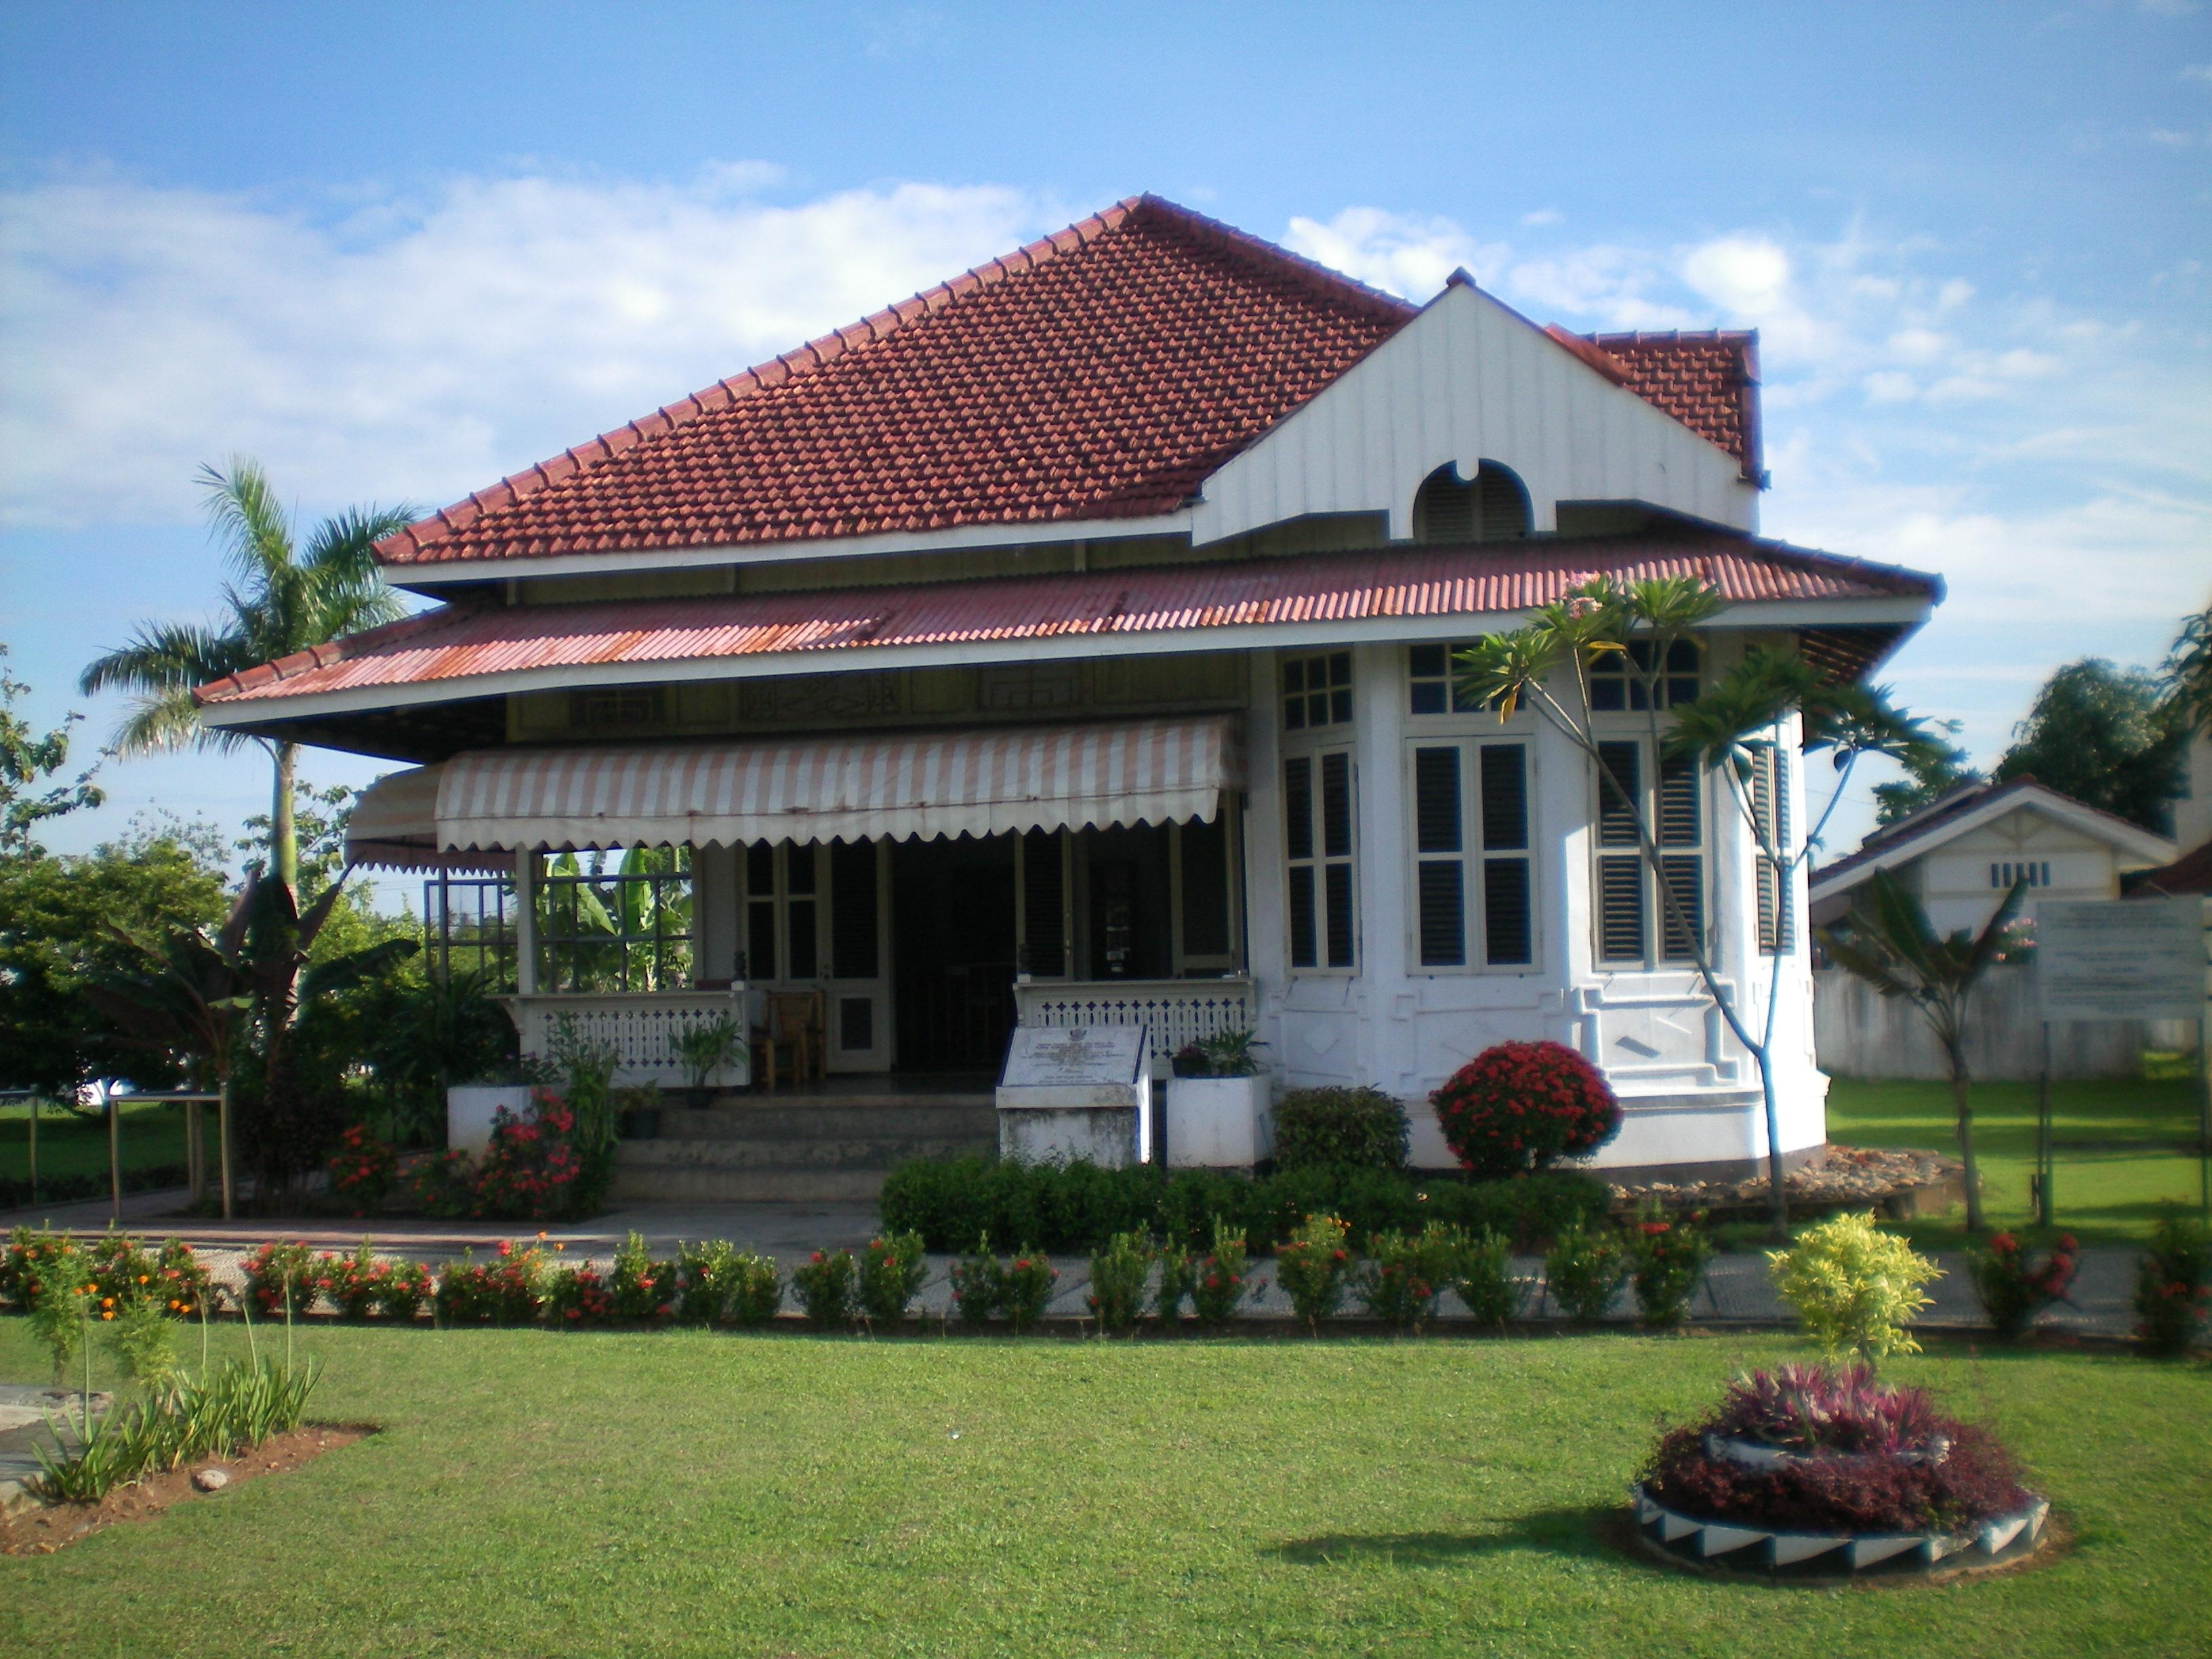 Agro Bungsu Peninggalan Peningalan Rumah Bungkarno Pengasingan Bung Karno Kota